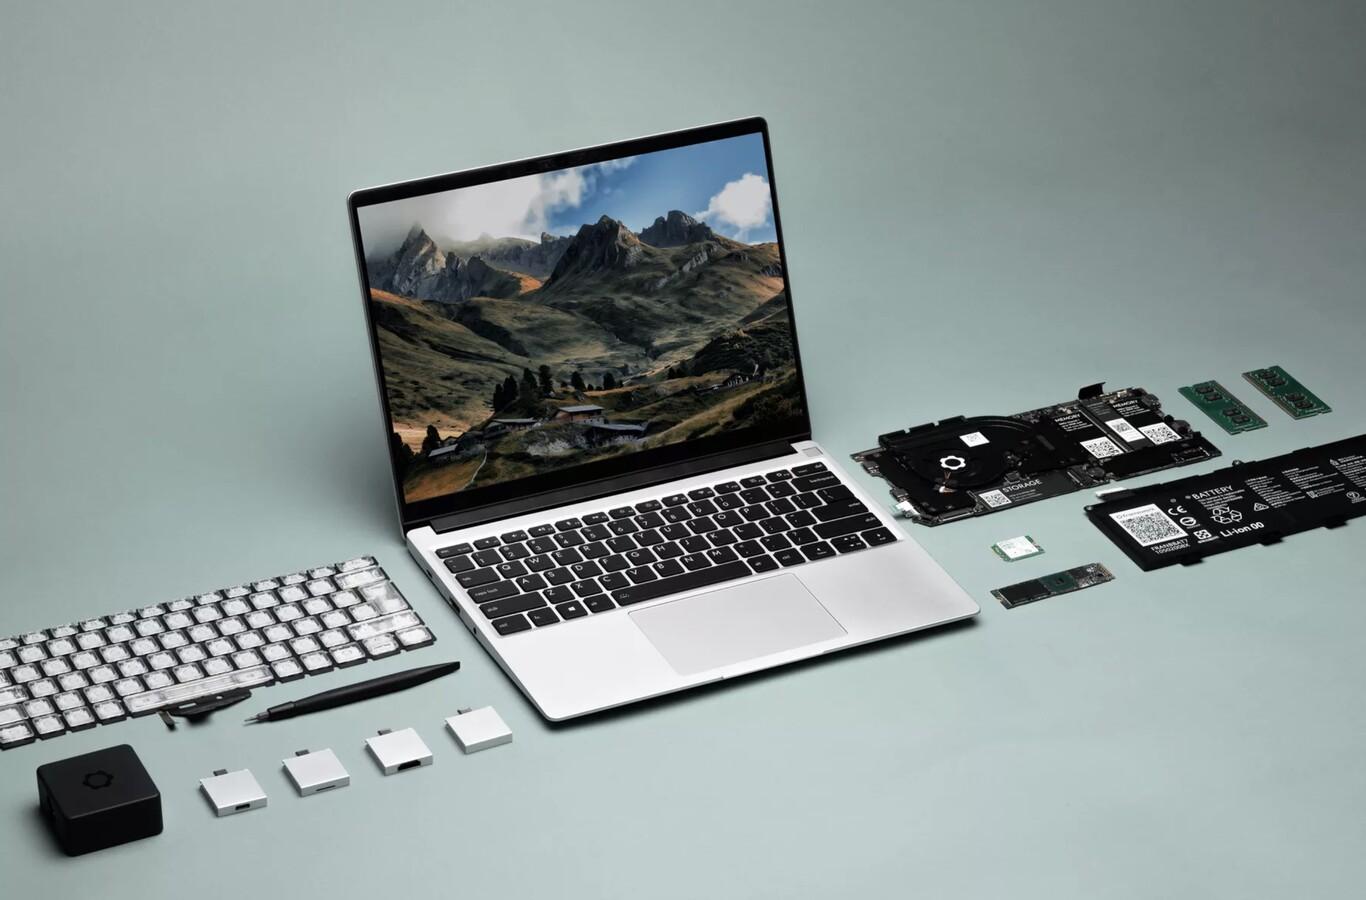 obsolescencia tecnológica en laptops programada